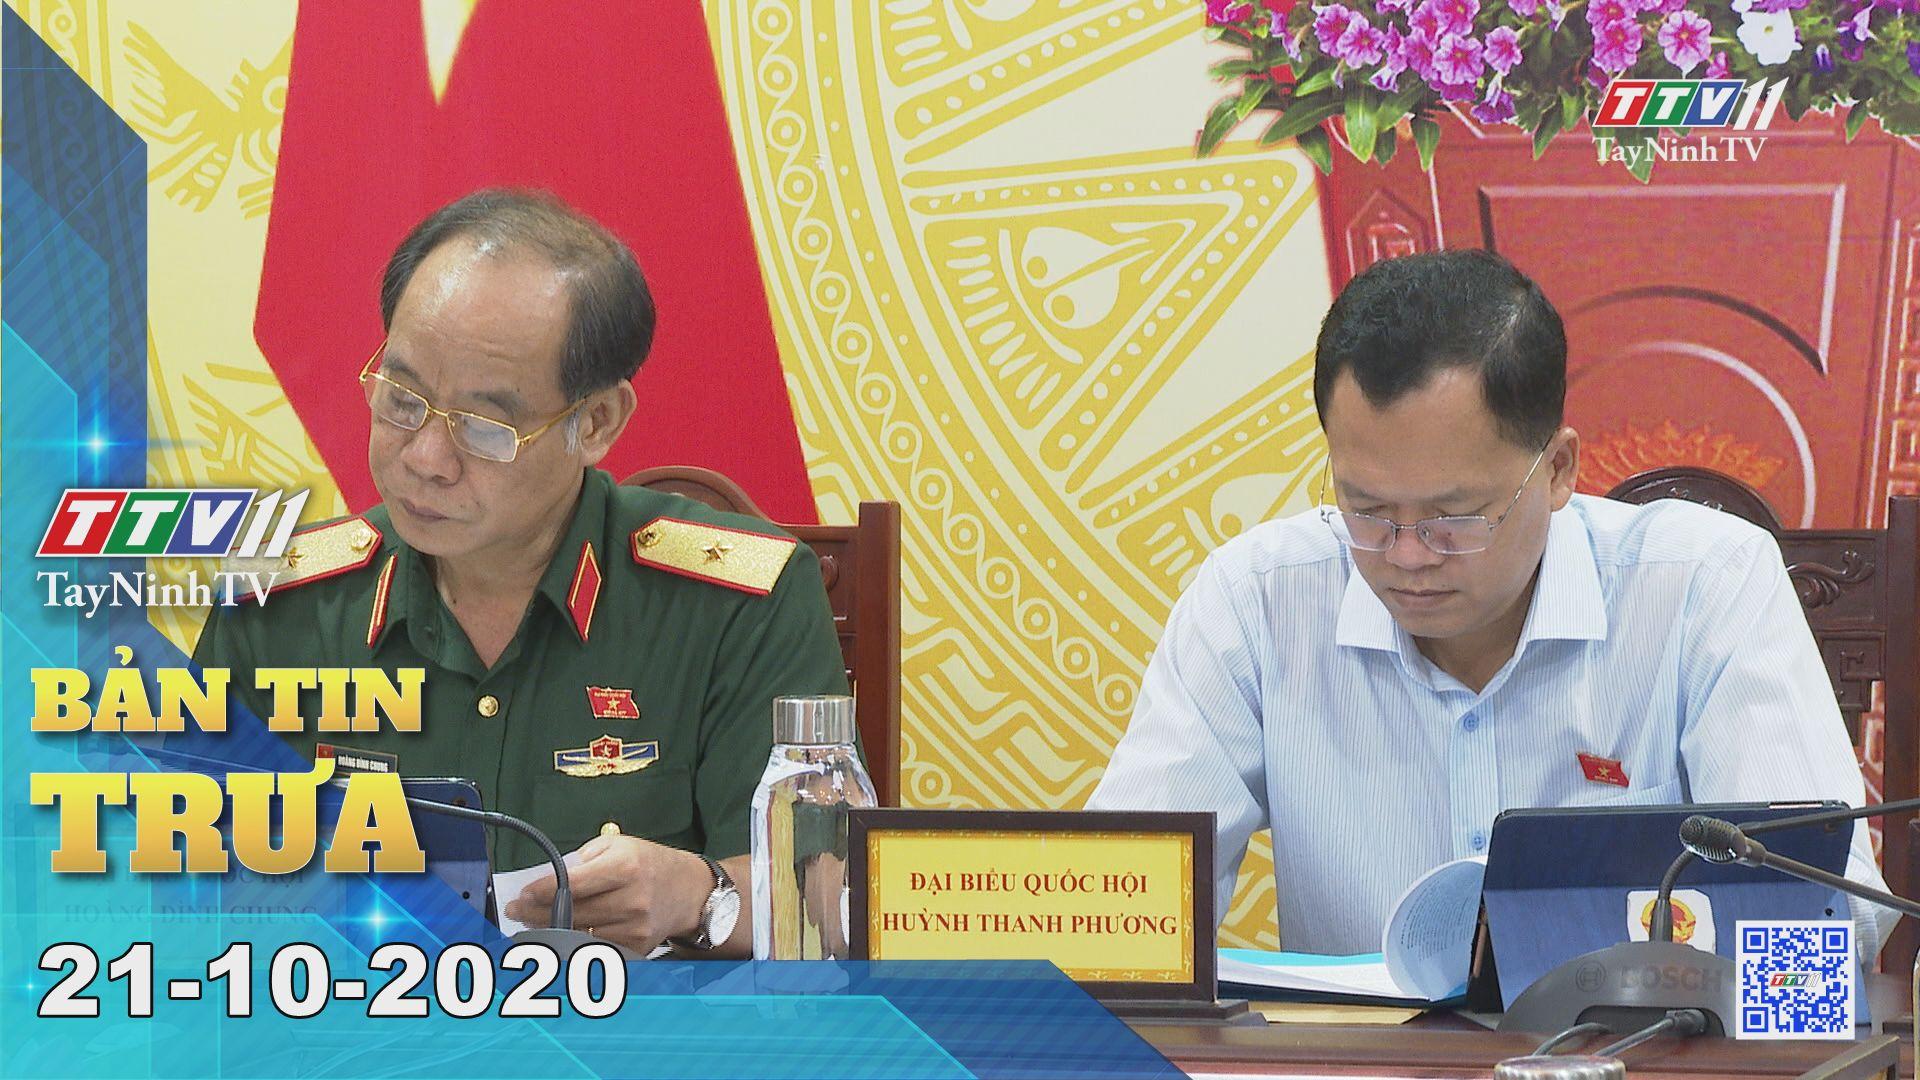 Bản tin trưa 21-10-2020 | Tin tức hôm nay | TayNinhTV